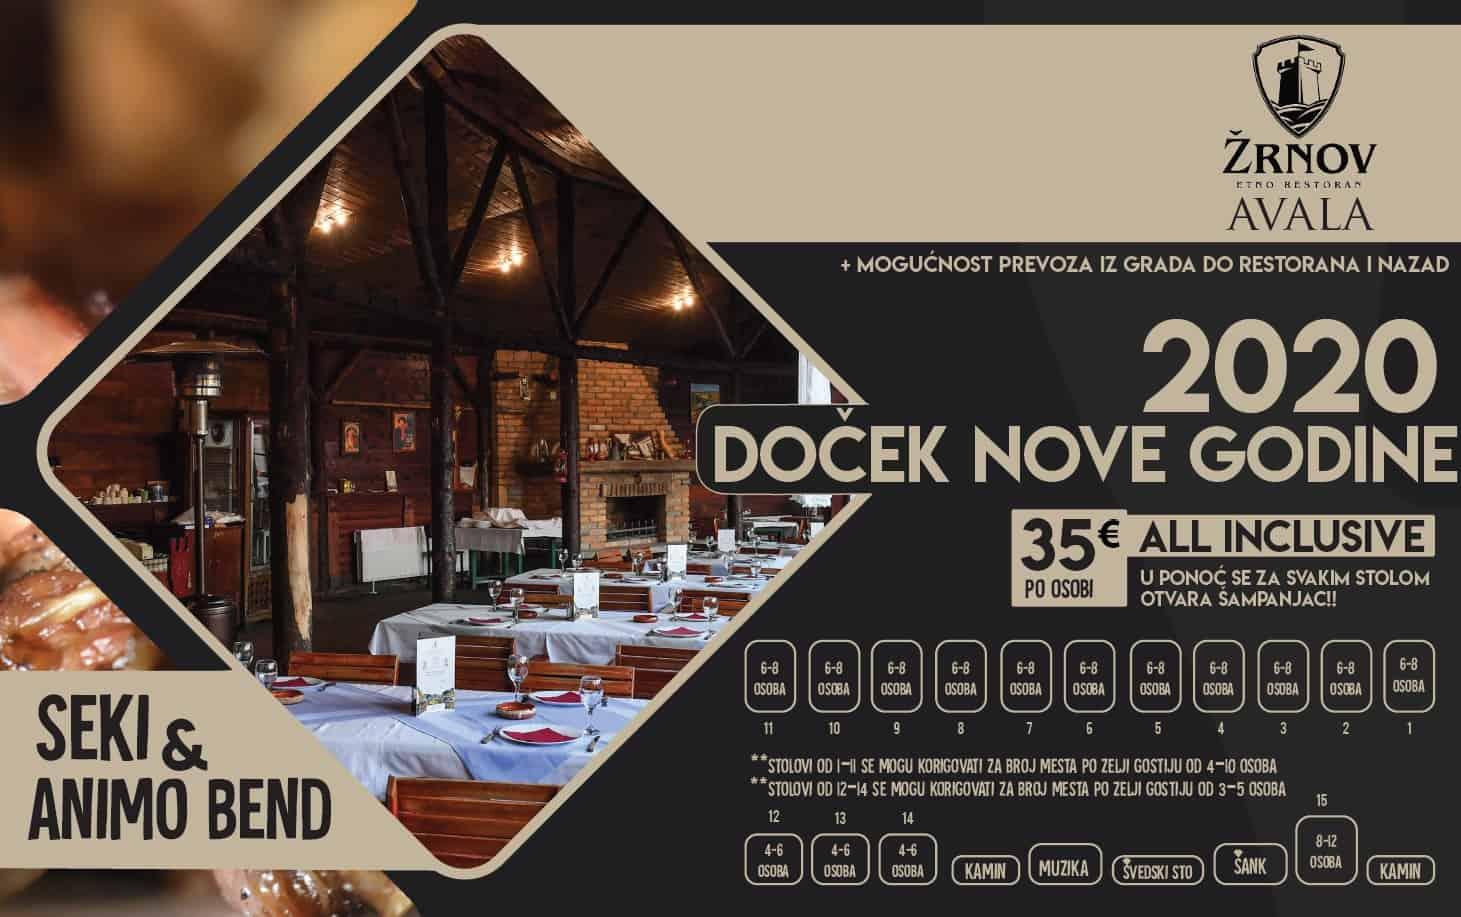 Docek Nove godine Beograd 2020 Restoran Zrnov Avala mapa